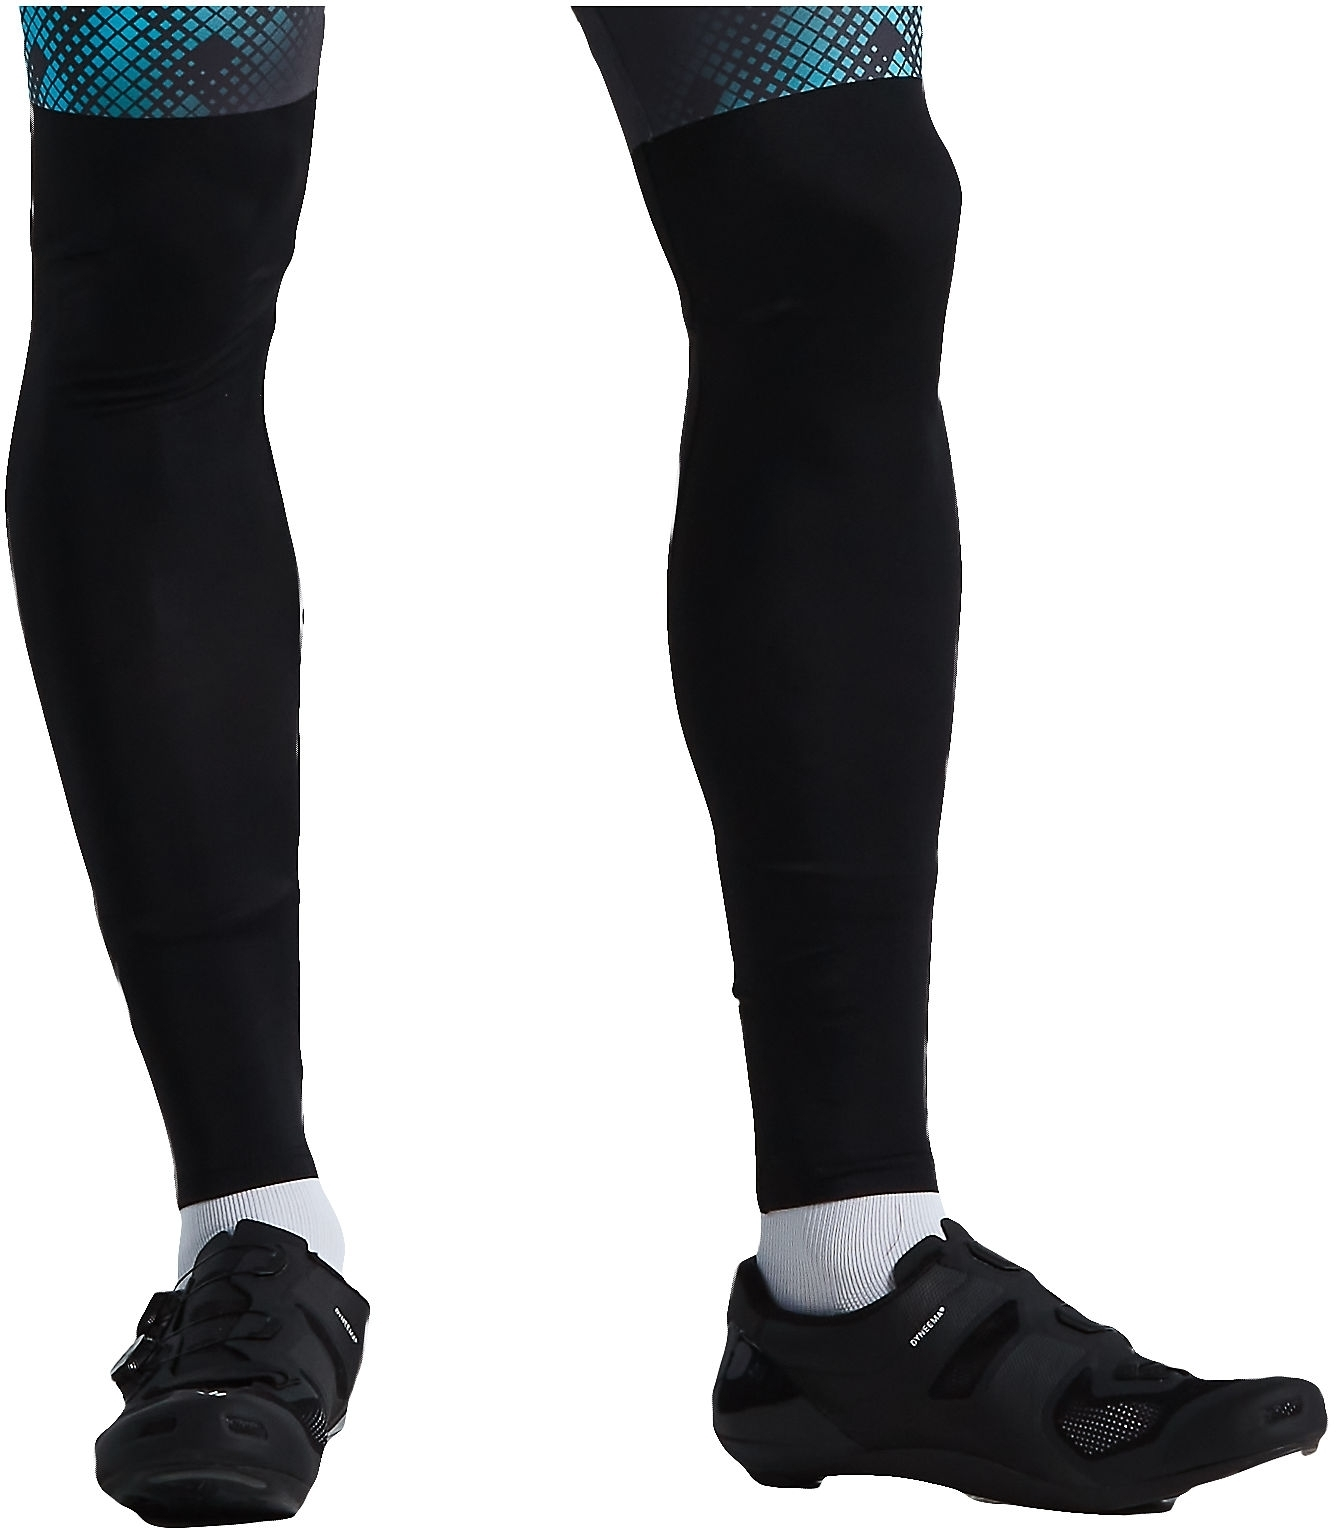 Specialized Leg Cover Lycra - black XL